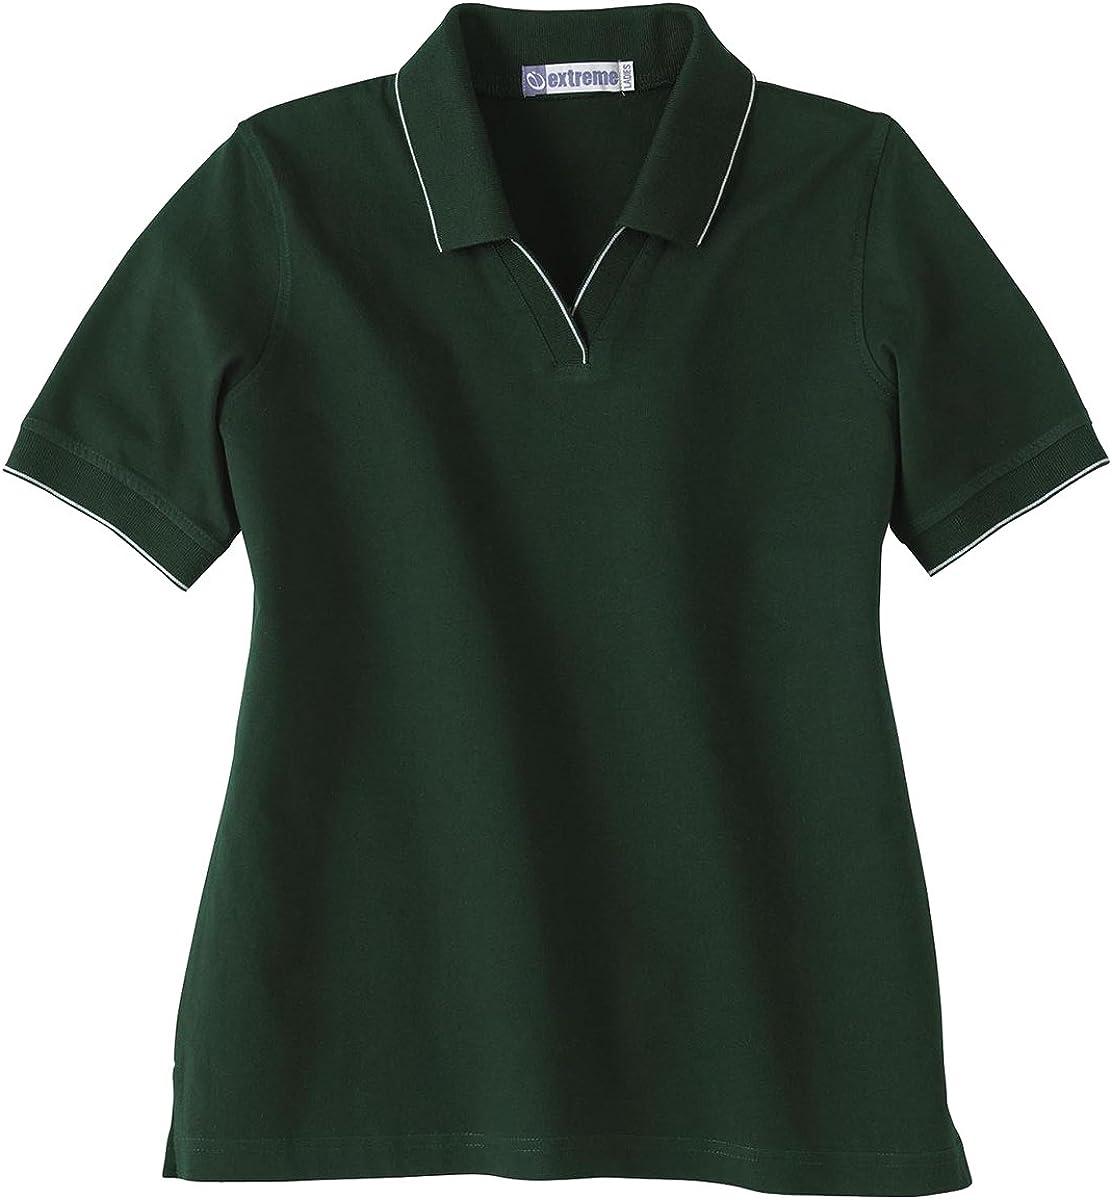 Extreme 75009 Ash City Ladies' Cotton Jersey Polo